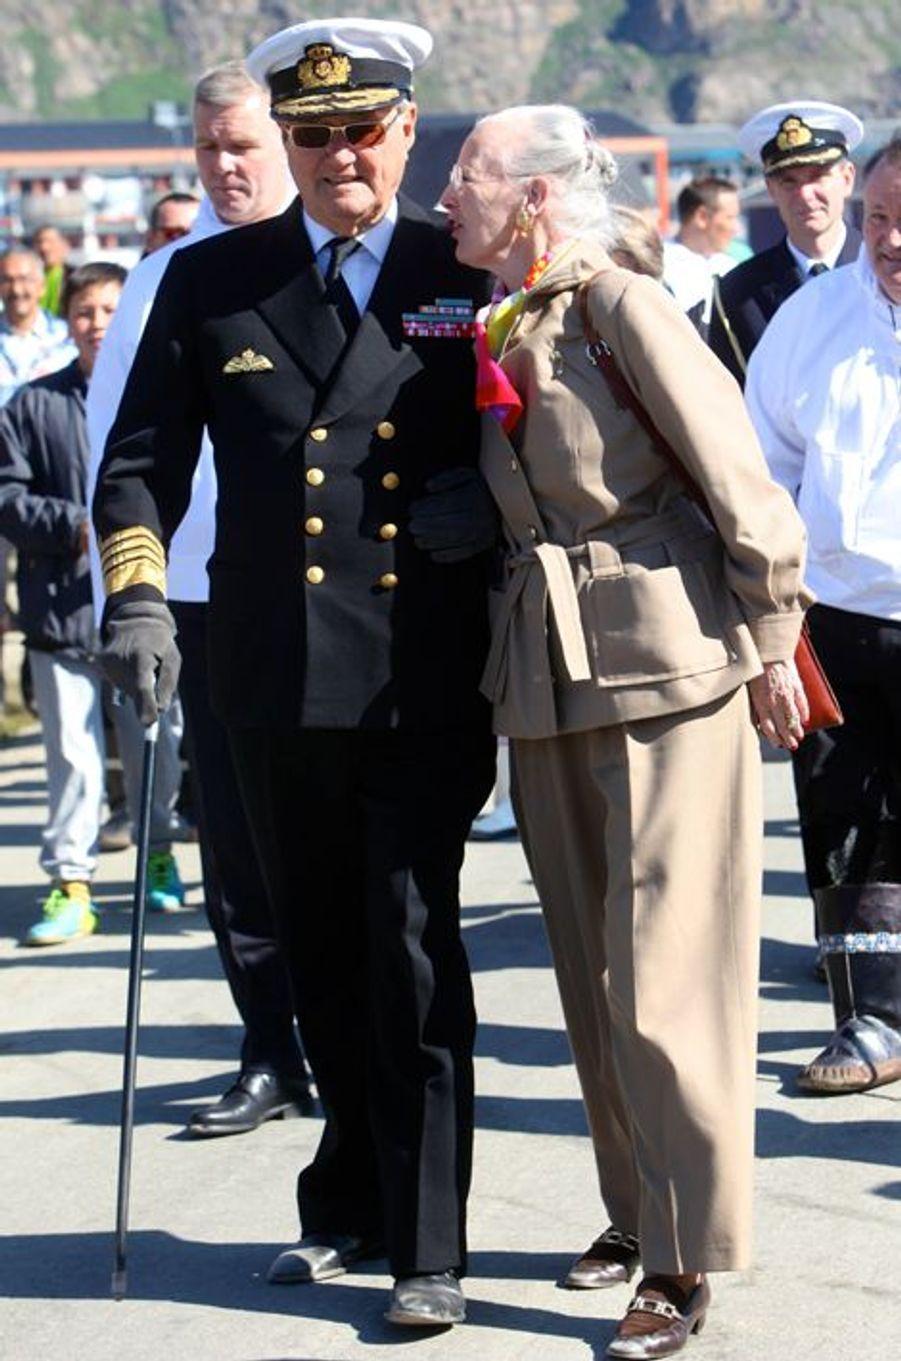 La reine Margrethe II et le prince Henrik du Danemark en tournée au Groenland, 21 et 22 juillet 2015